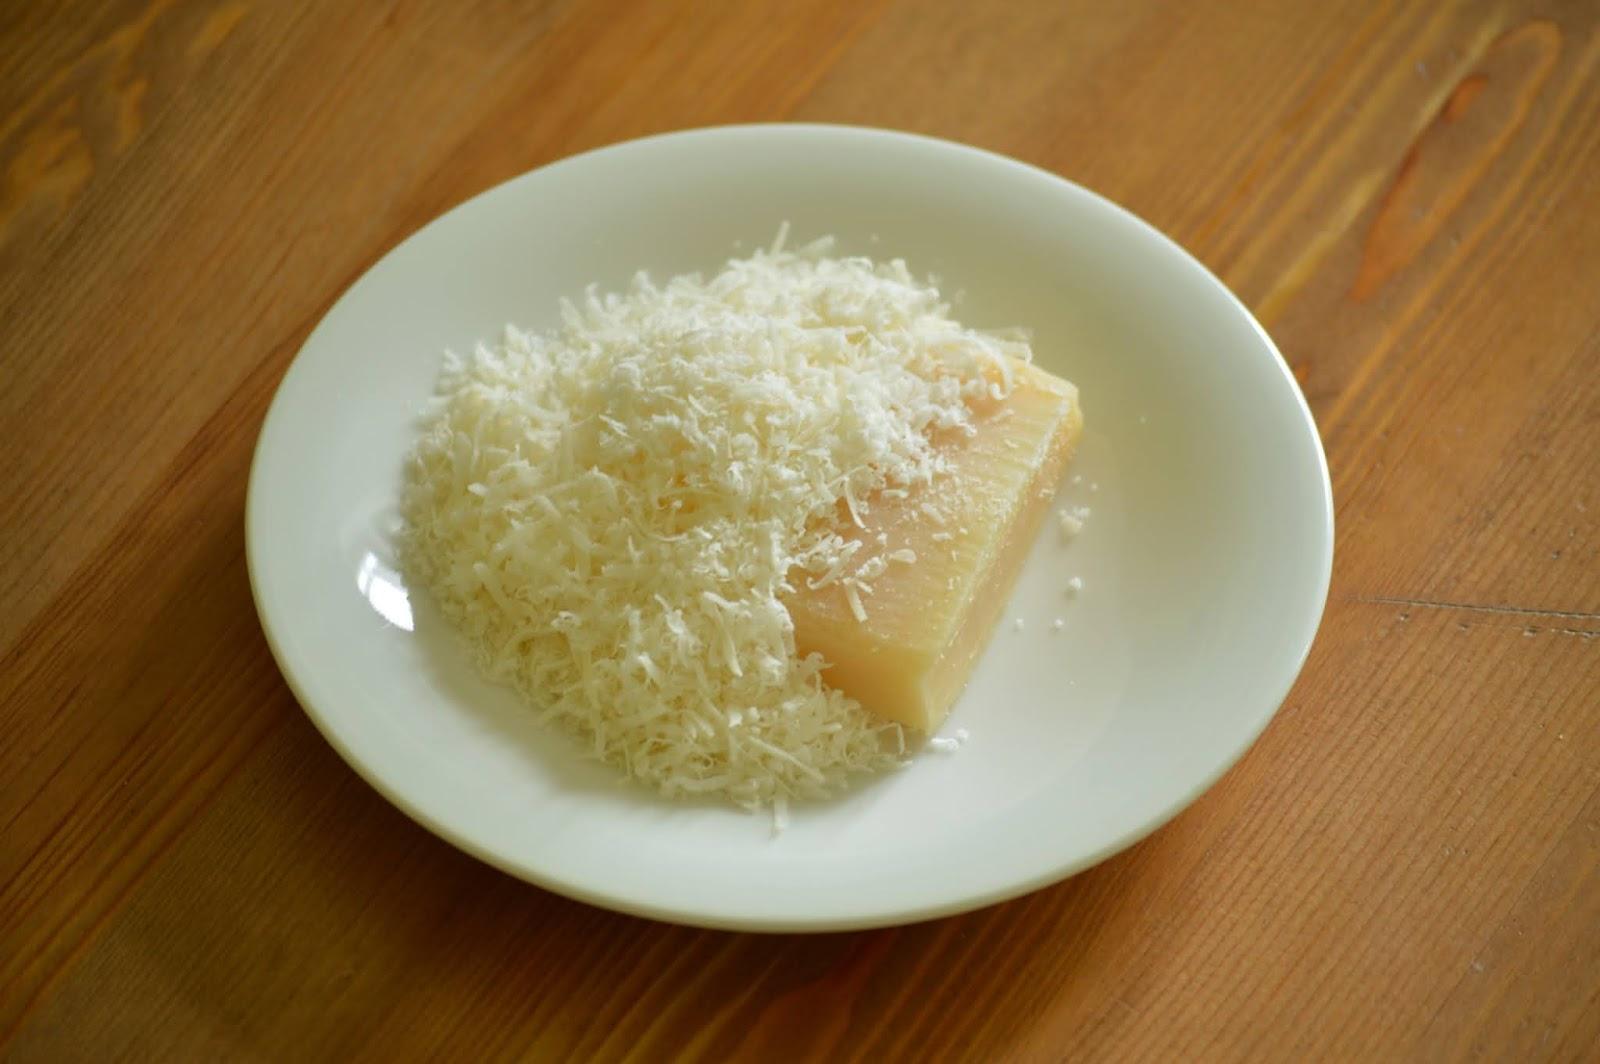 passover dessert recipes 2020